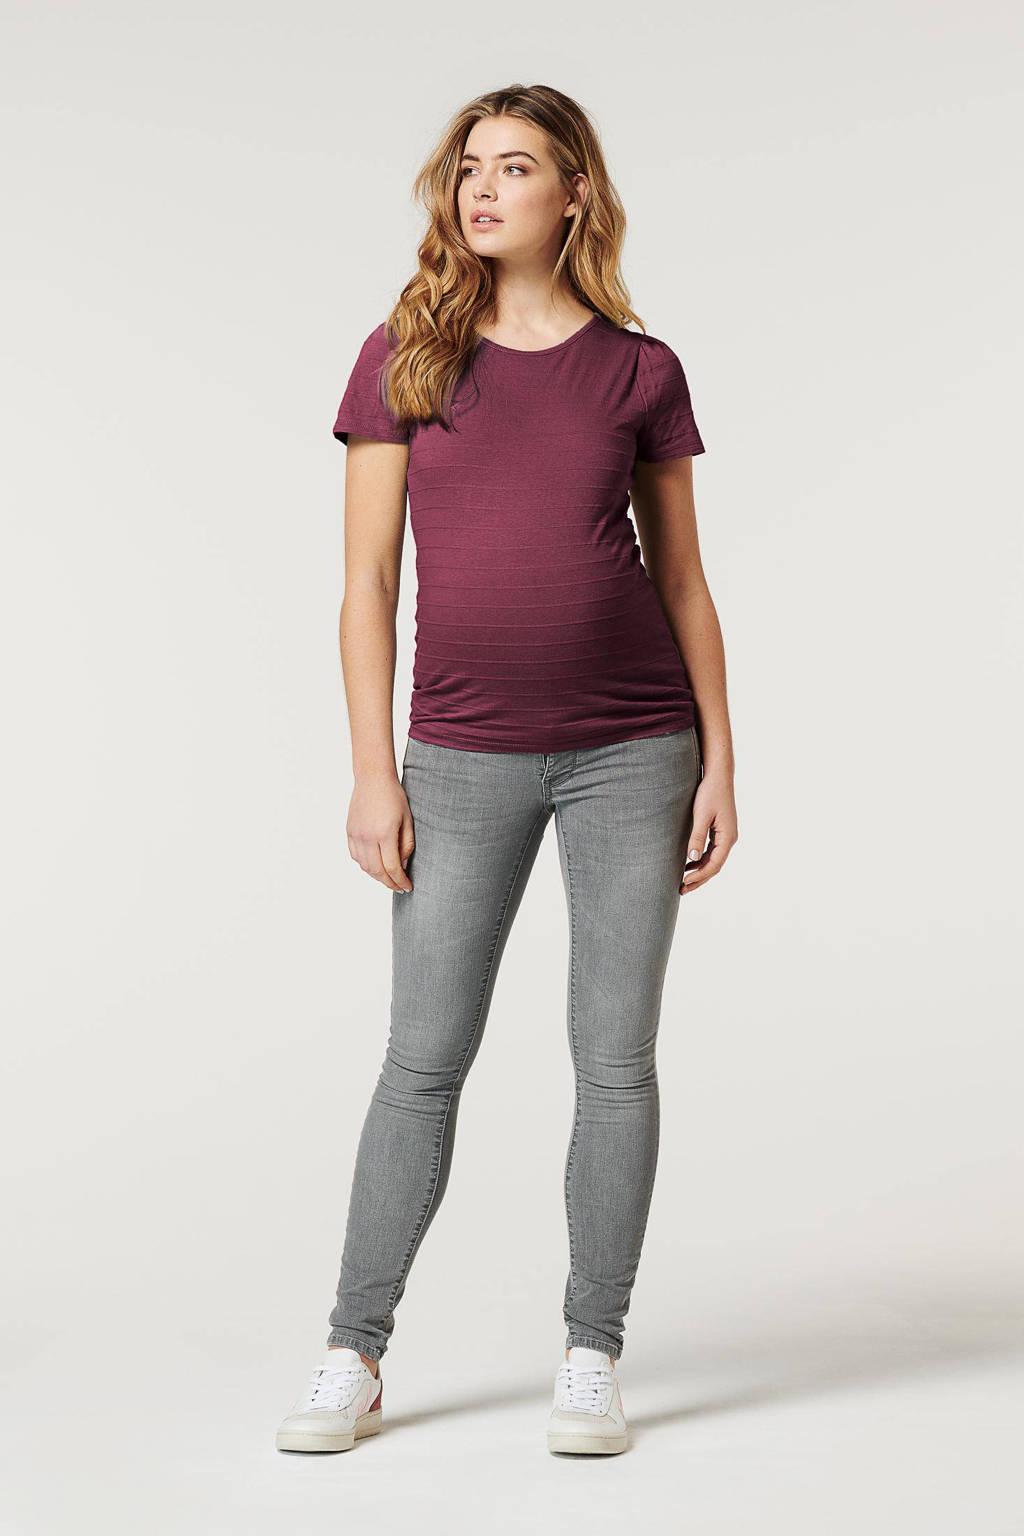 Noppies low waist skinny zwangerschapsjeans Avi grijs, 32